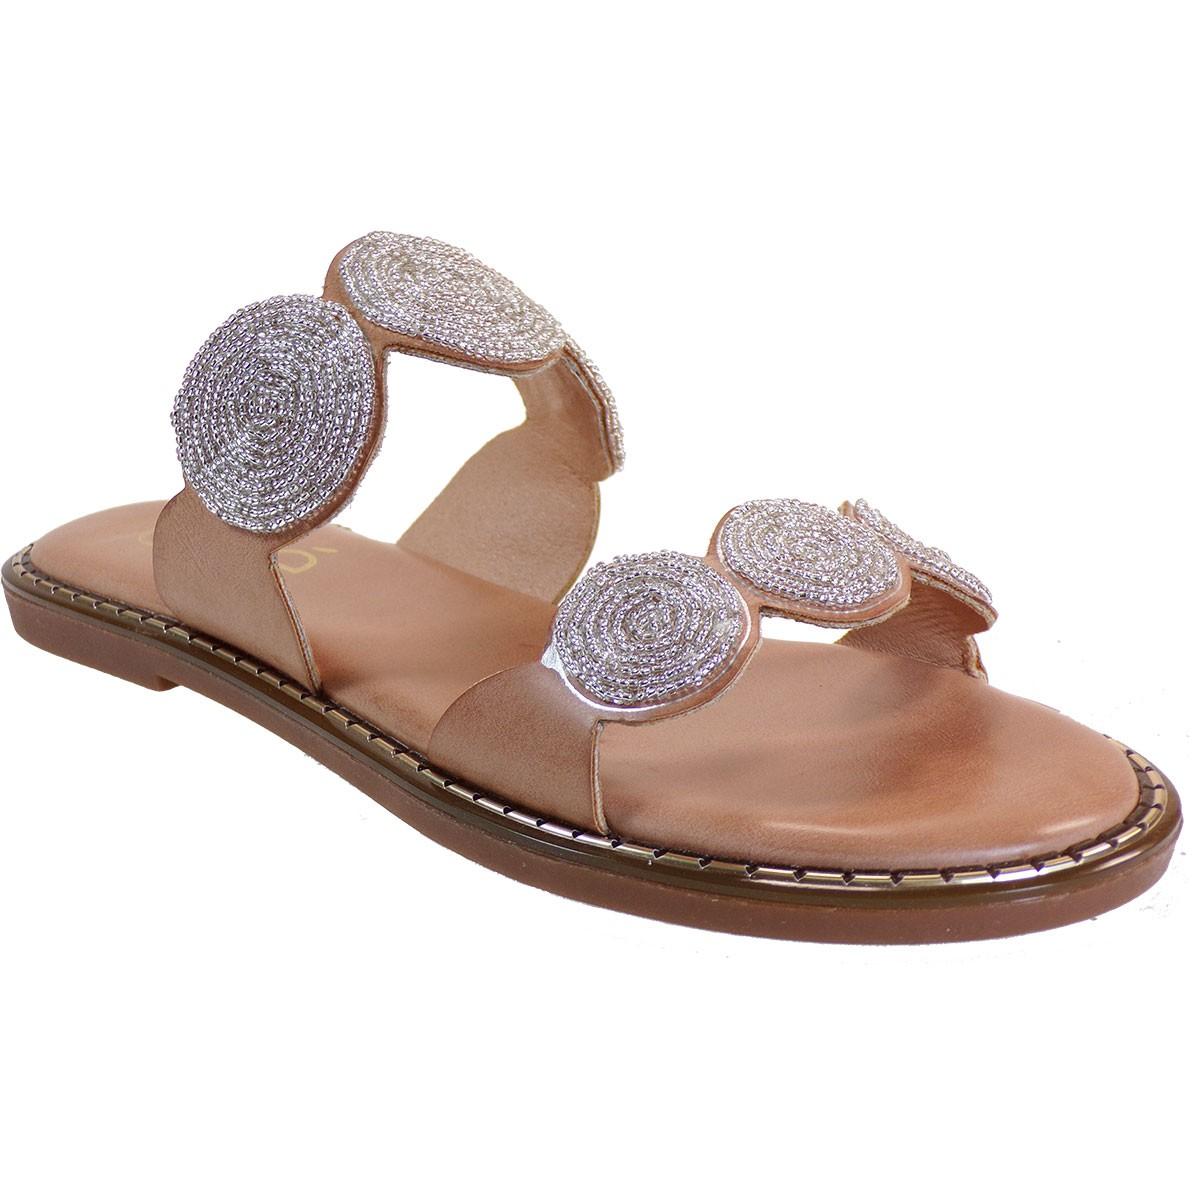 EXE Shoes Γυναικεία Παντόφλας ALLISON-112 Καμηλό M47001121417